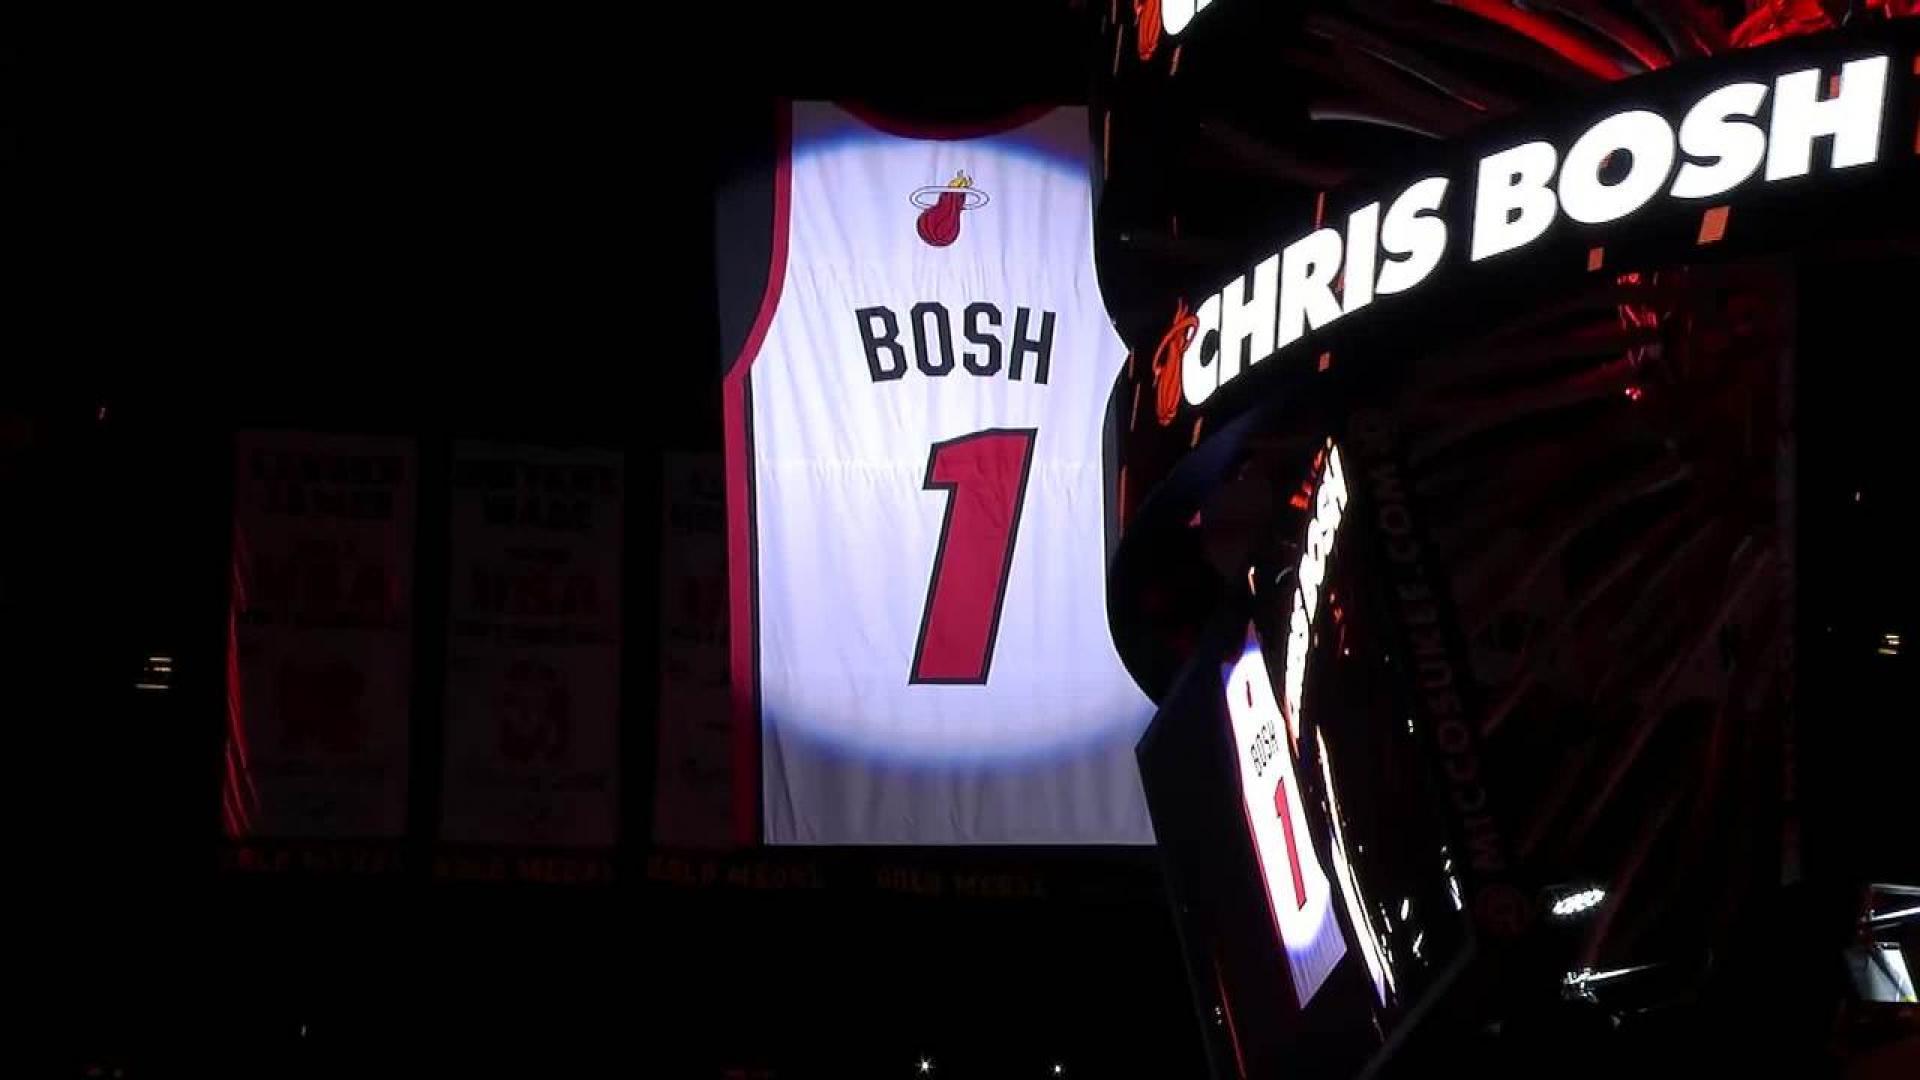 Heat raise Chris Bosh's No. 1 jersey to rafters